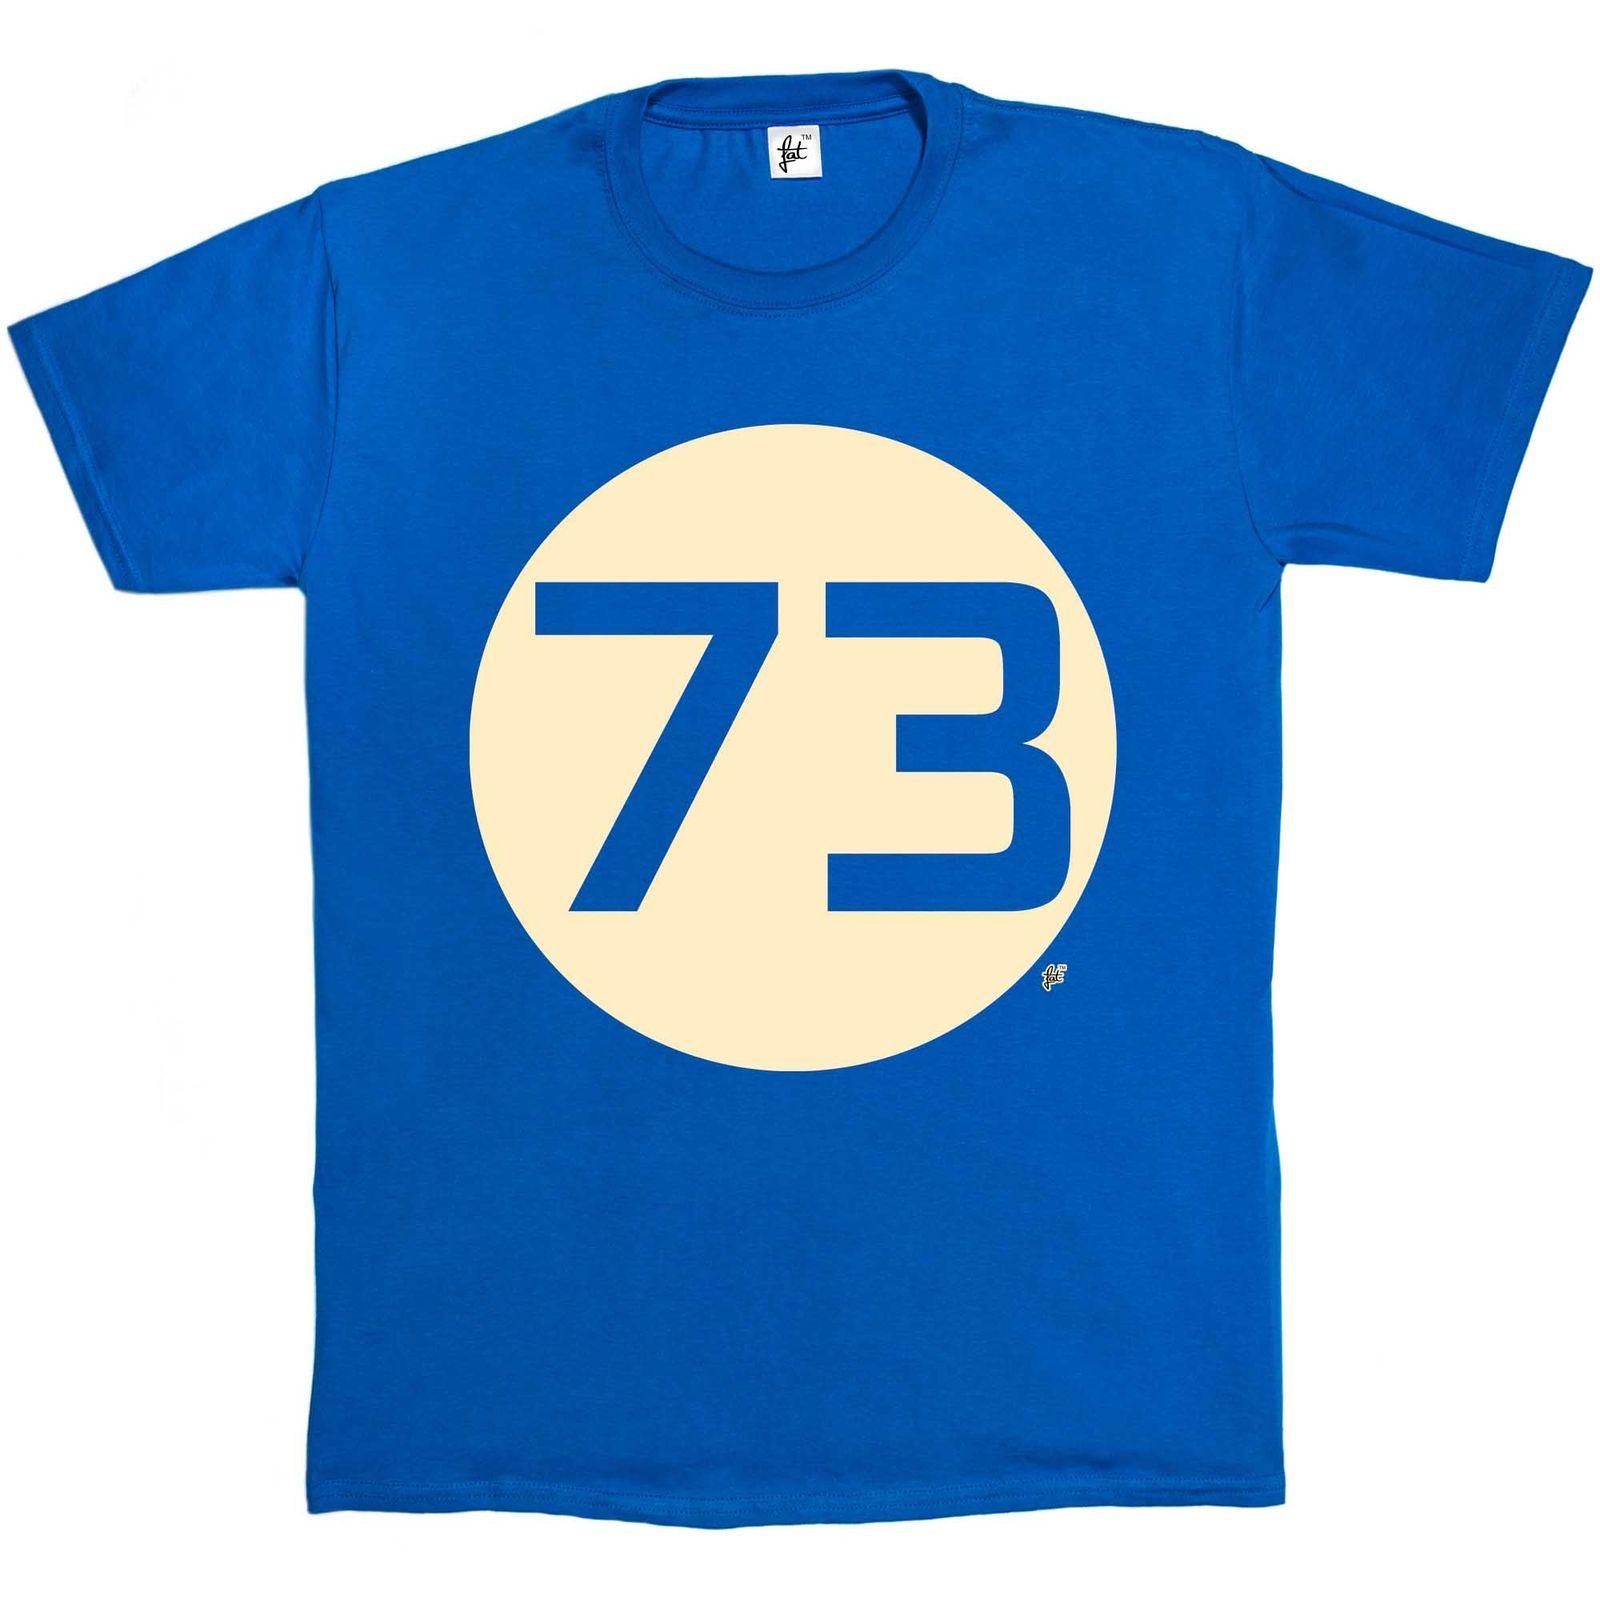 Sheldons Favourite Number 73 Seventy Three BBT Mens T-Shirt Tops Tees Printed Men T Shirt